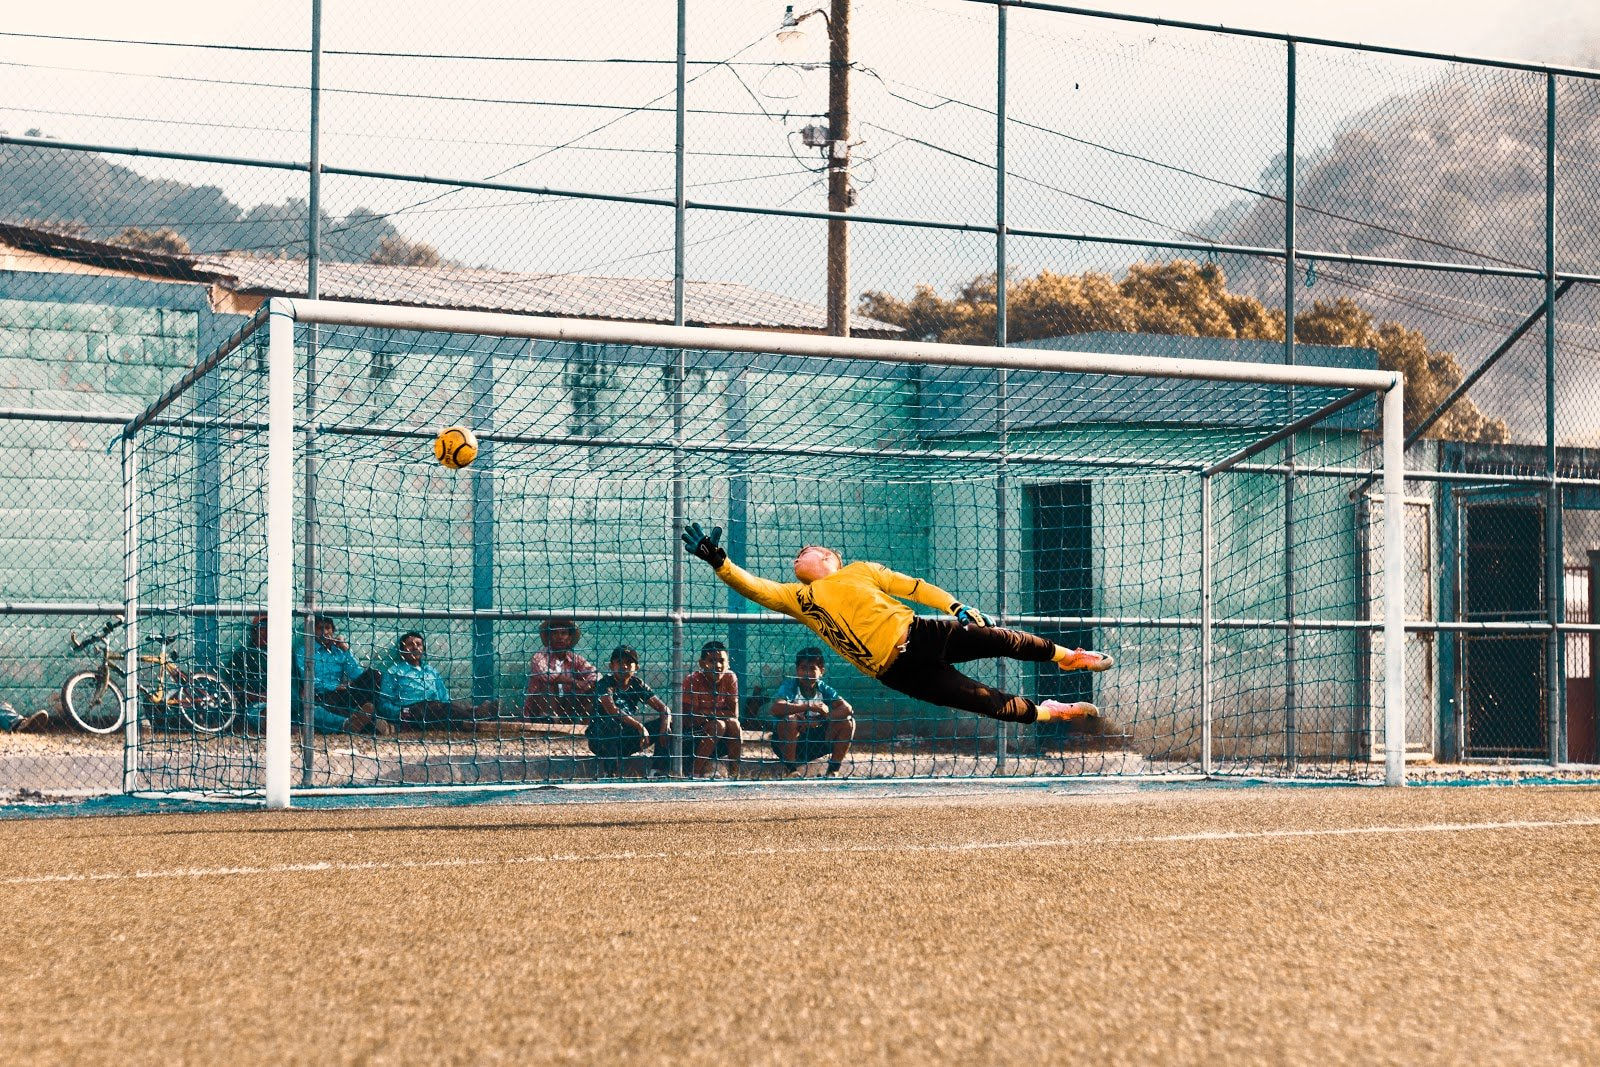 Action shot of a goalie blocking a ball by Alvaro Mendoza